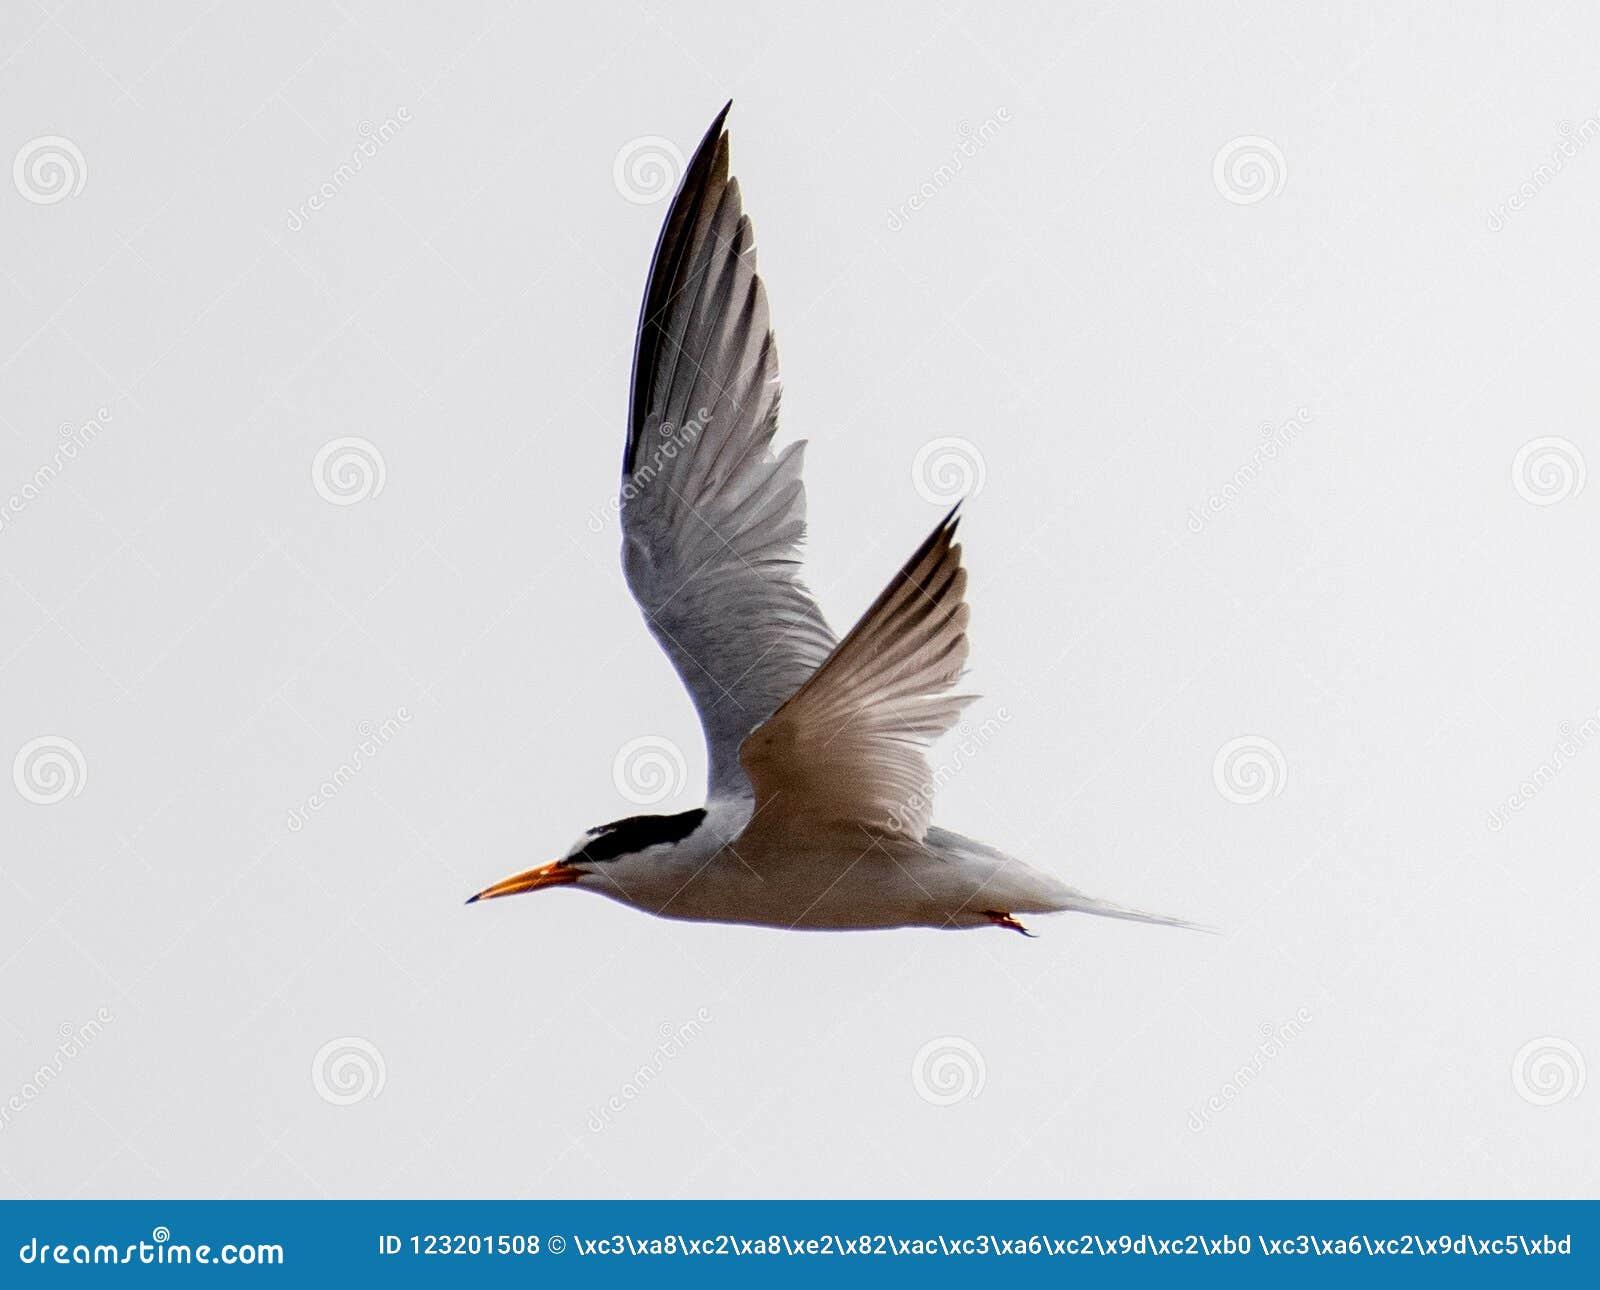 Seagulls And Petrel On The Edge Of Bohai Stock Photo - Image of hand